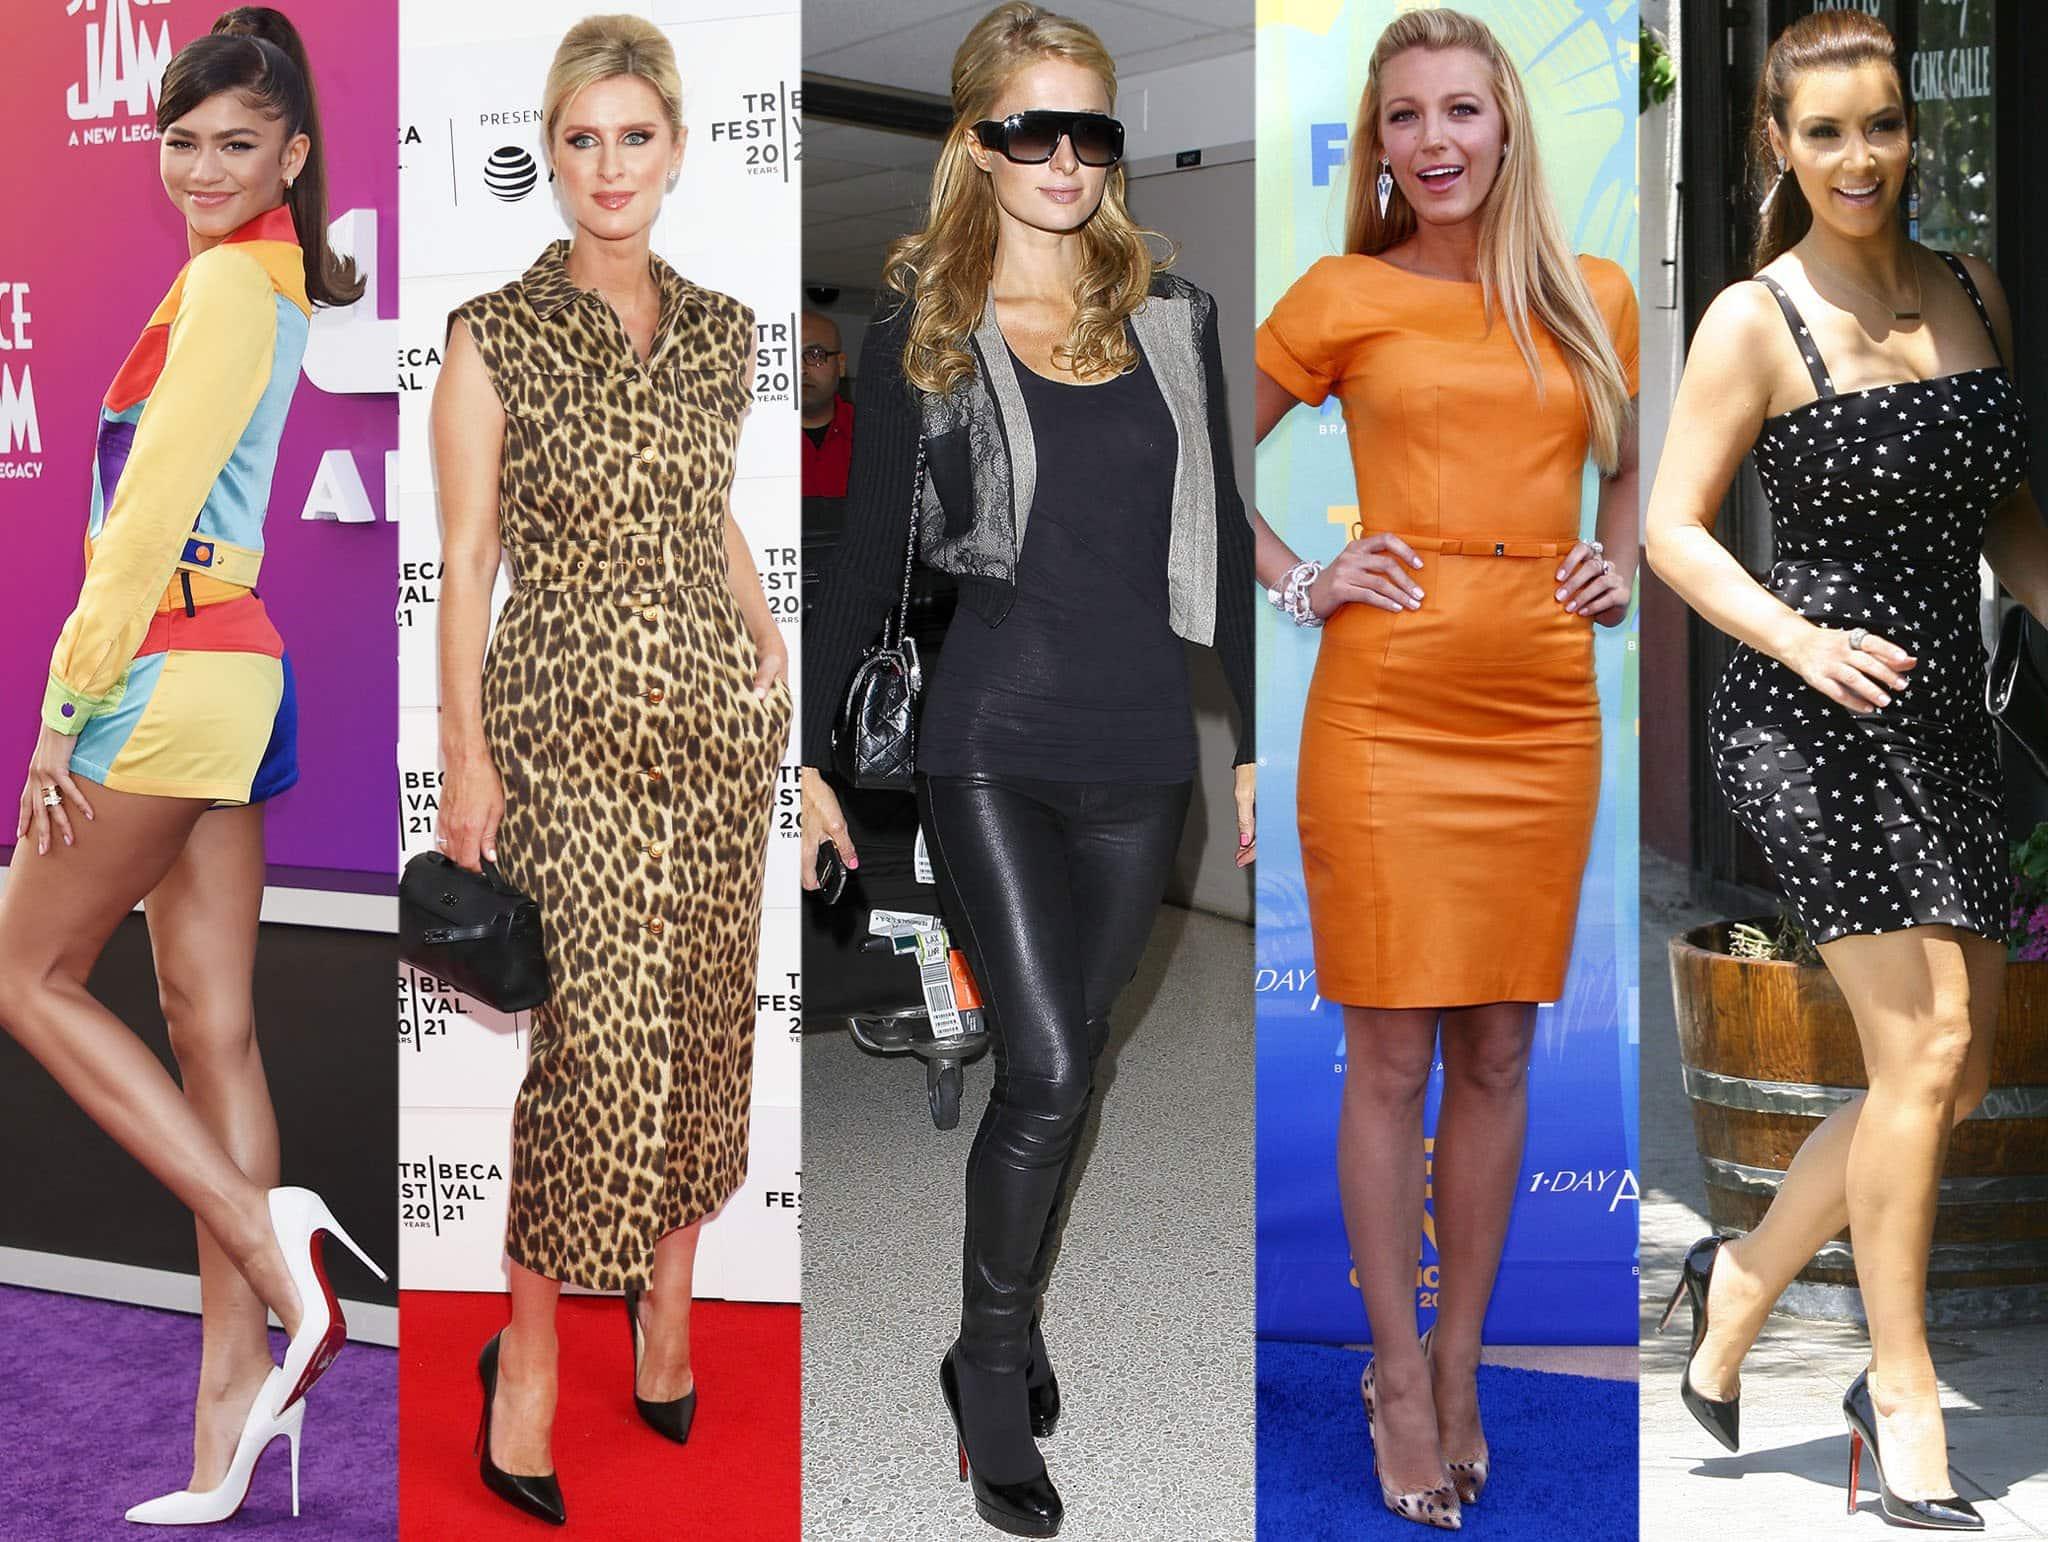 Zendaya, Nicky Hilton, Paris Hilton, Blake Lively, and Kim Kardashian are just a few of the many celebrities who love Christian Louboutin heels